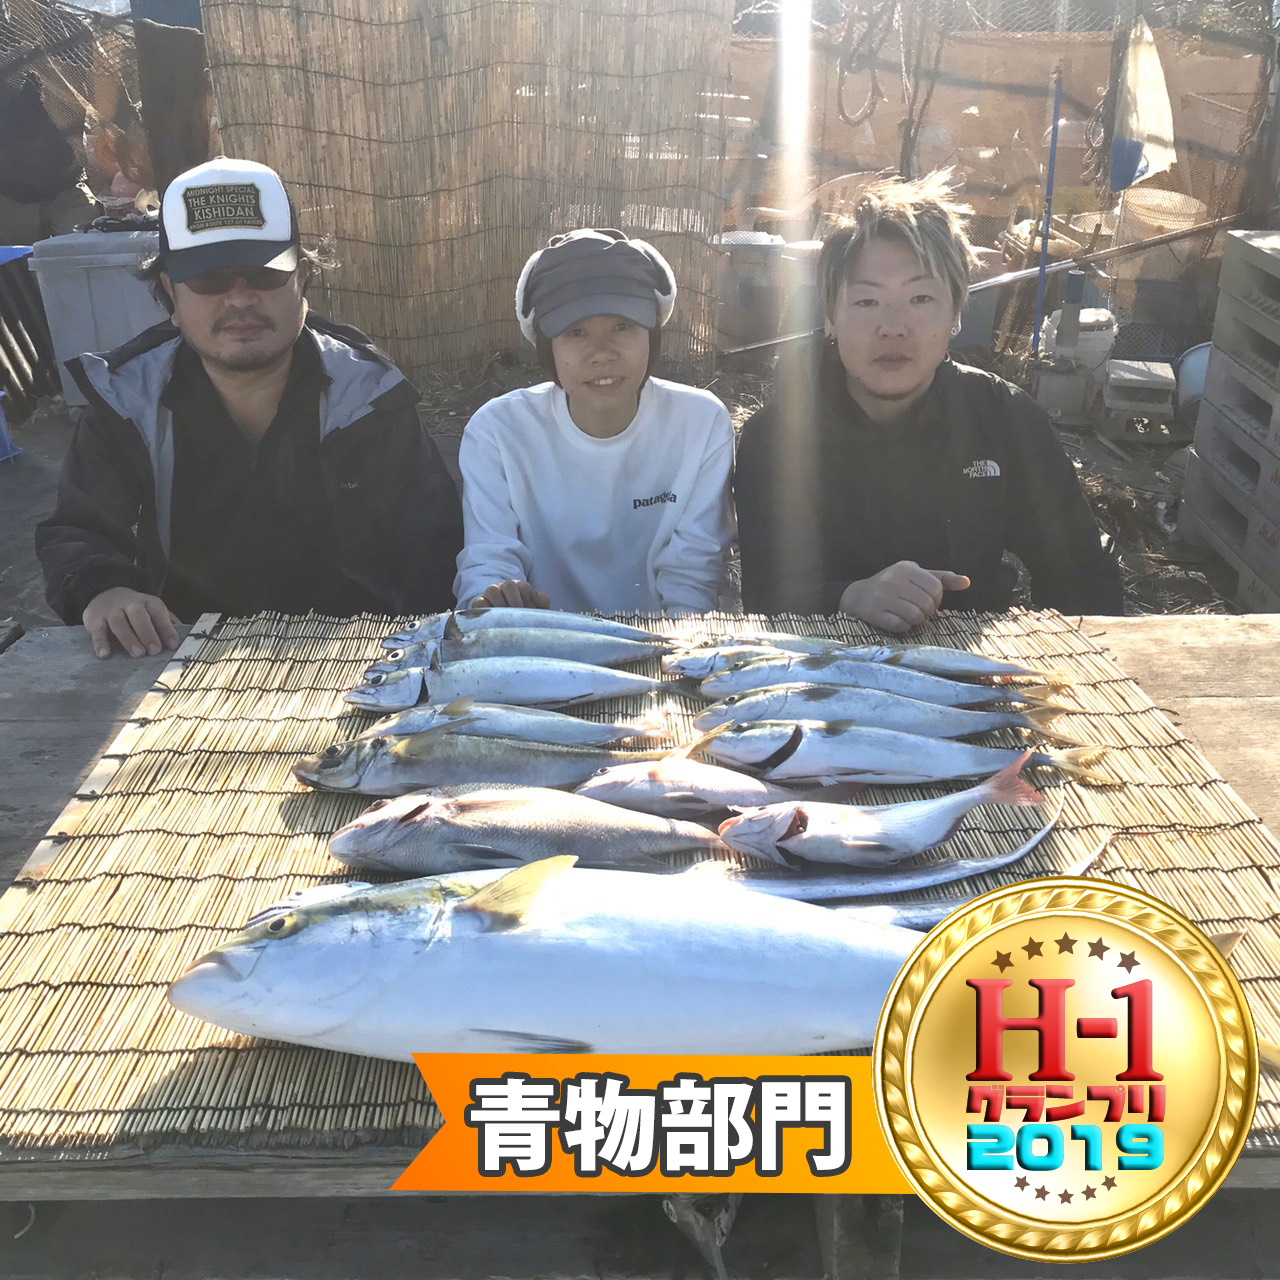 H1グランプリ青物部門賞